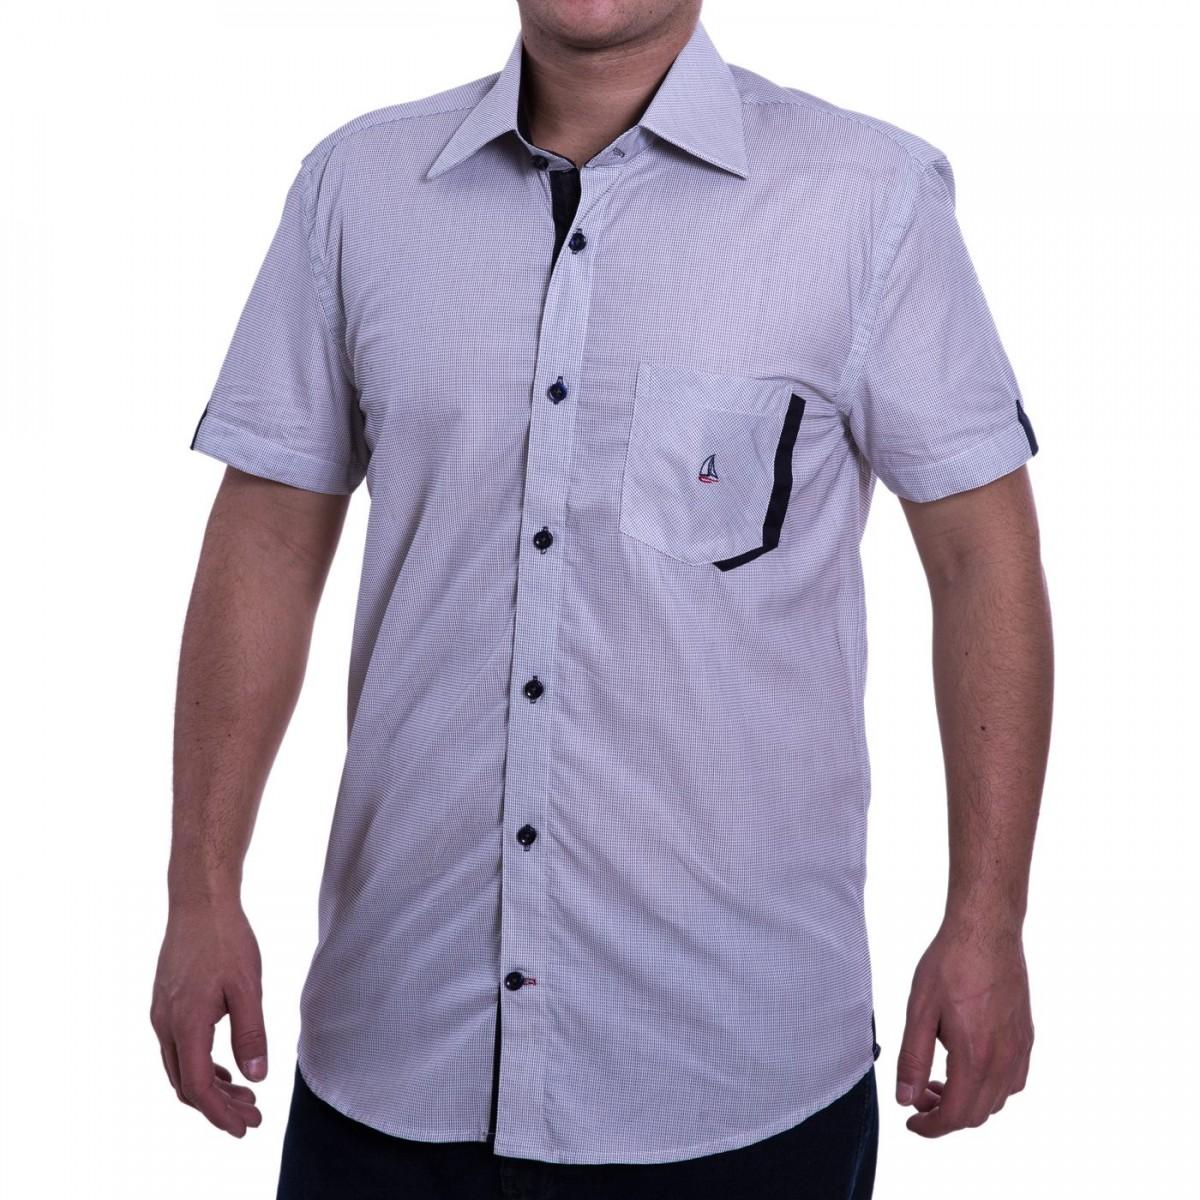 4d6ee81c15 Bizz Store - Camisa Social Masculina Porto CO Slim Manga Curta